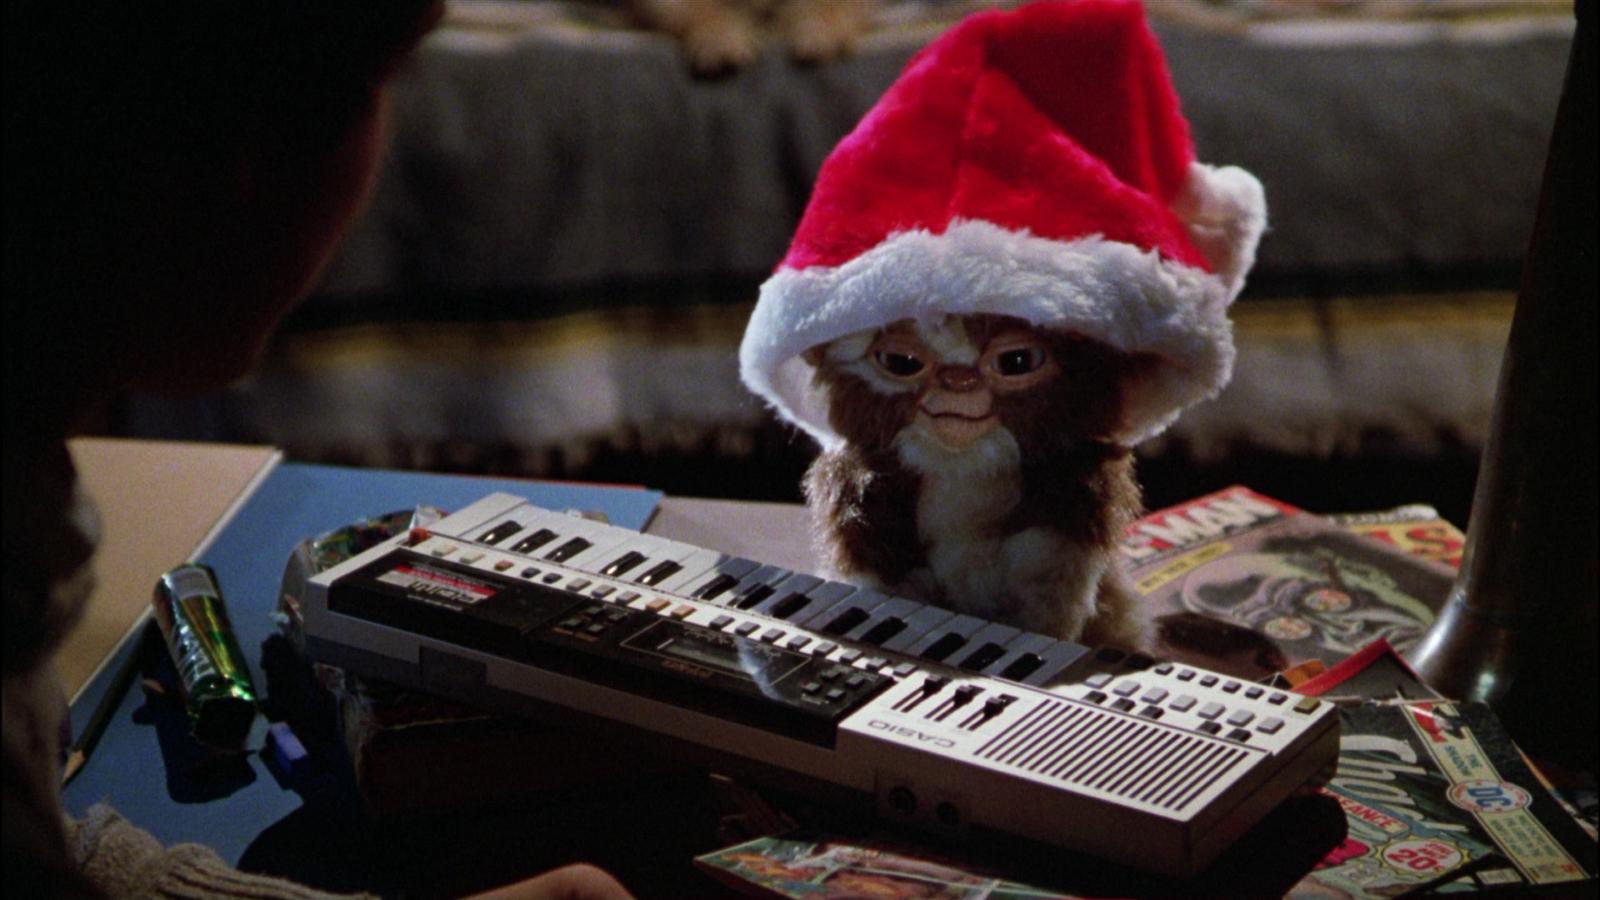 MINNA GILLIGAN: On not having the Christmas spirit